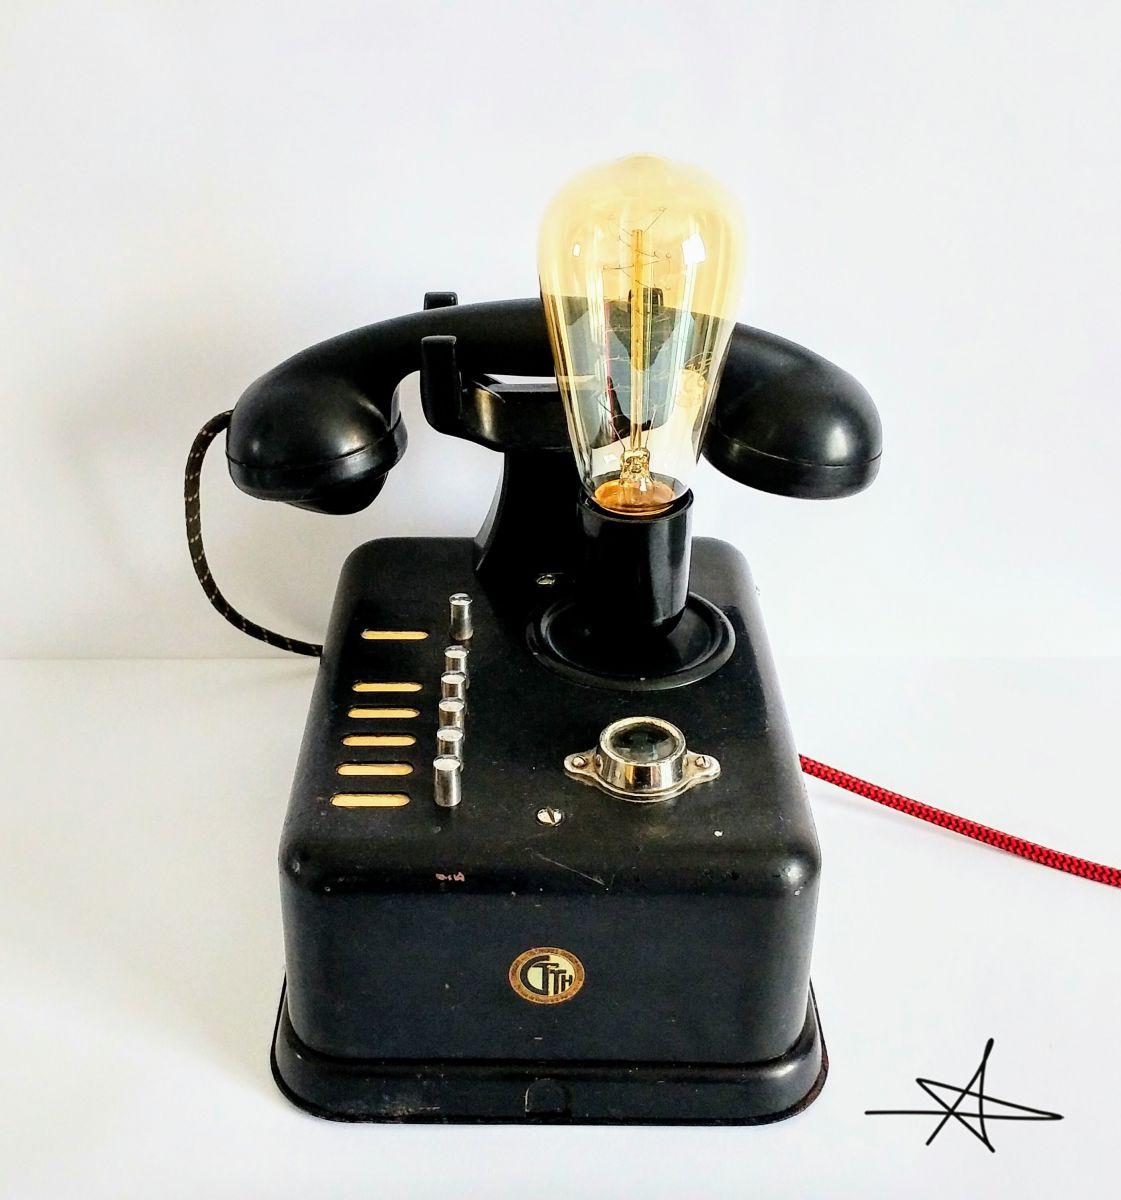 Lampe industrielle lampe vintage big black phone 39 luckyfind - Lampe vintage industrielle ...